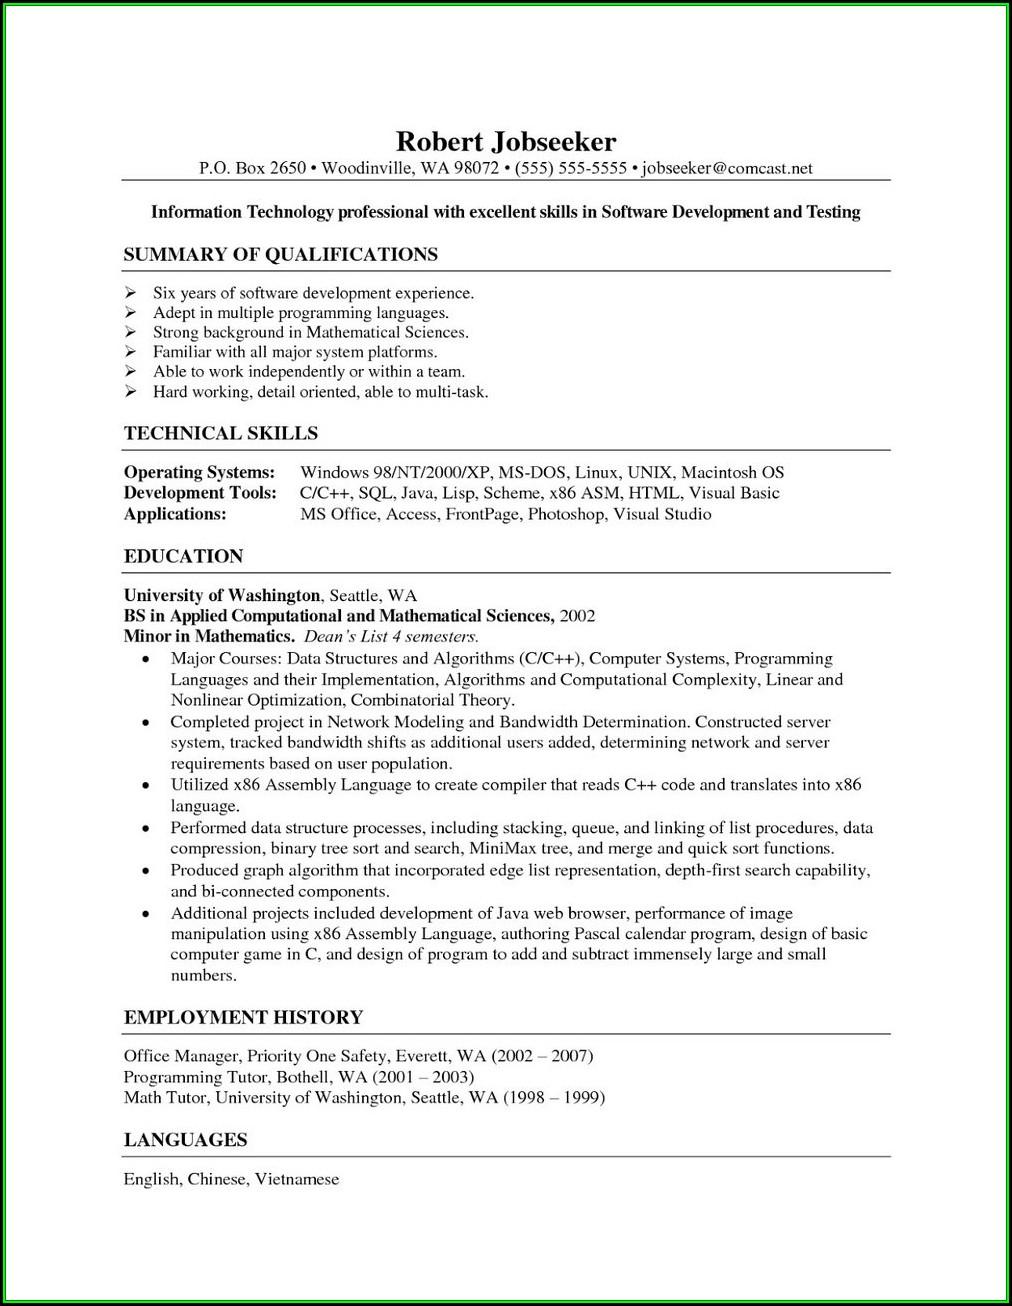 Resume For Entry Level Medical Billing And Coding